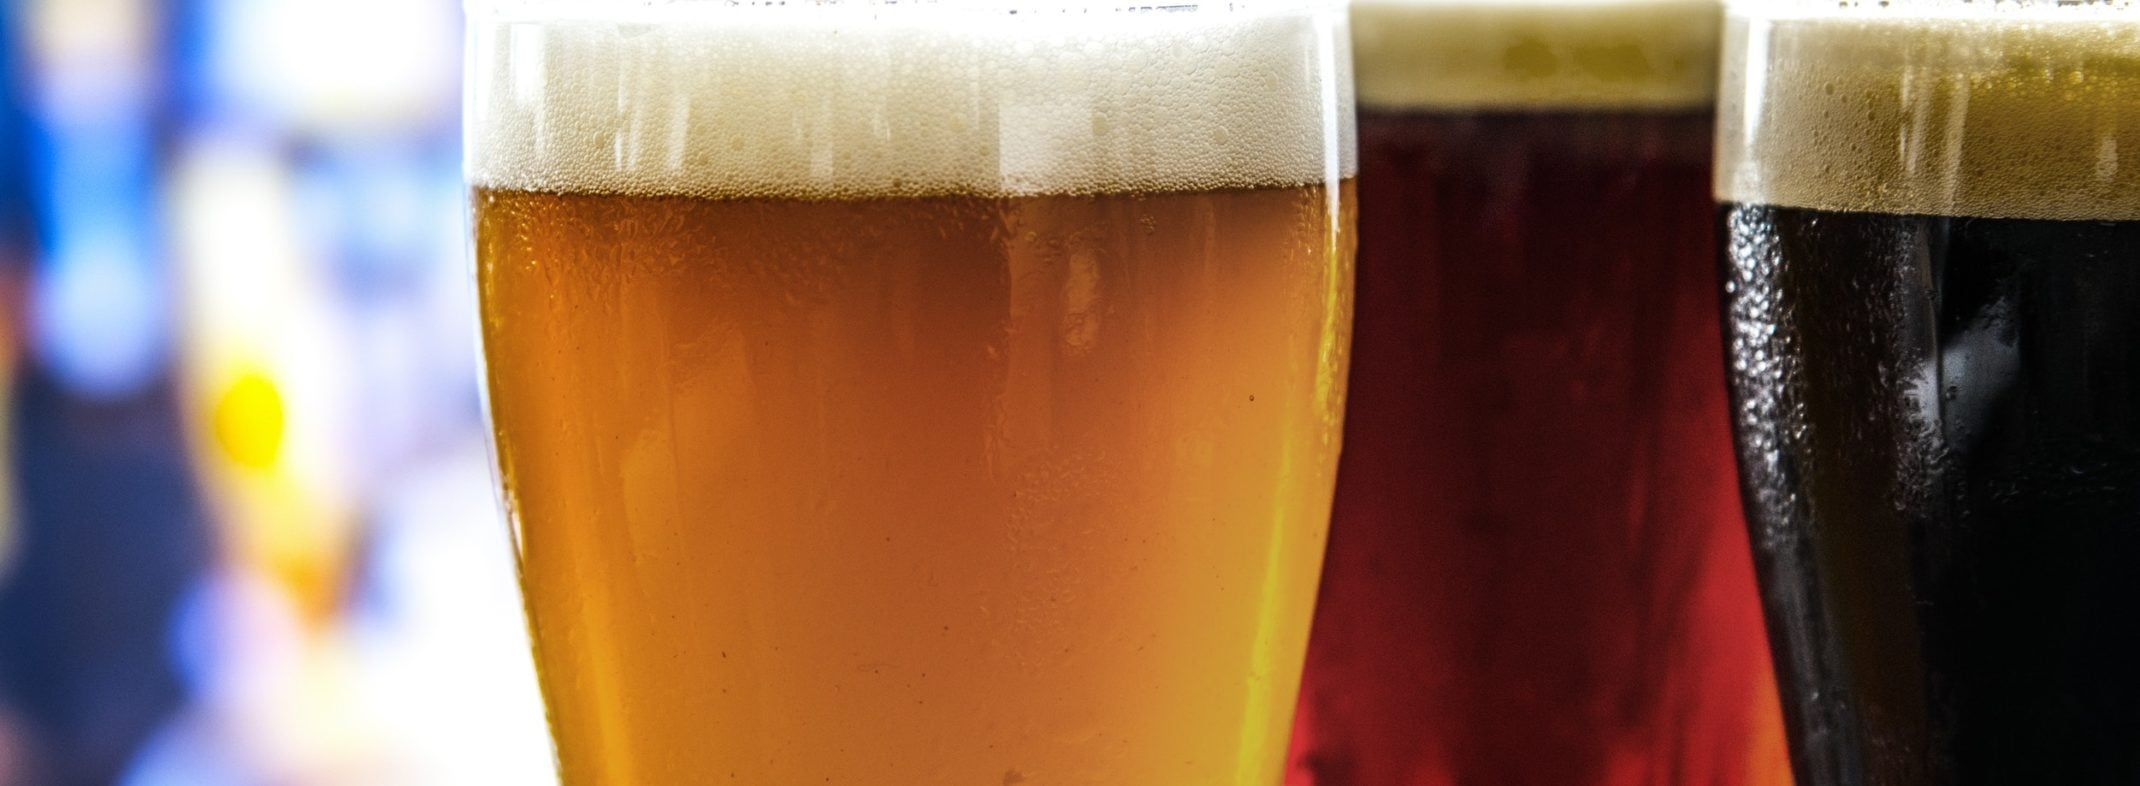 Mid-Strength Beers